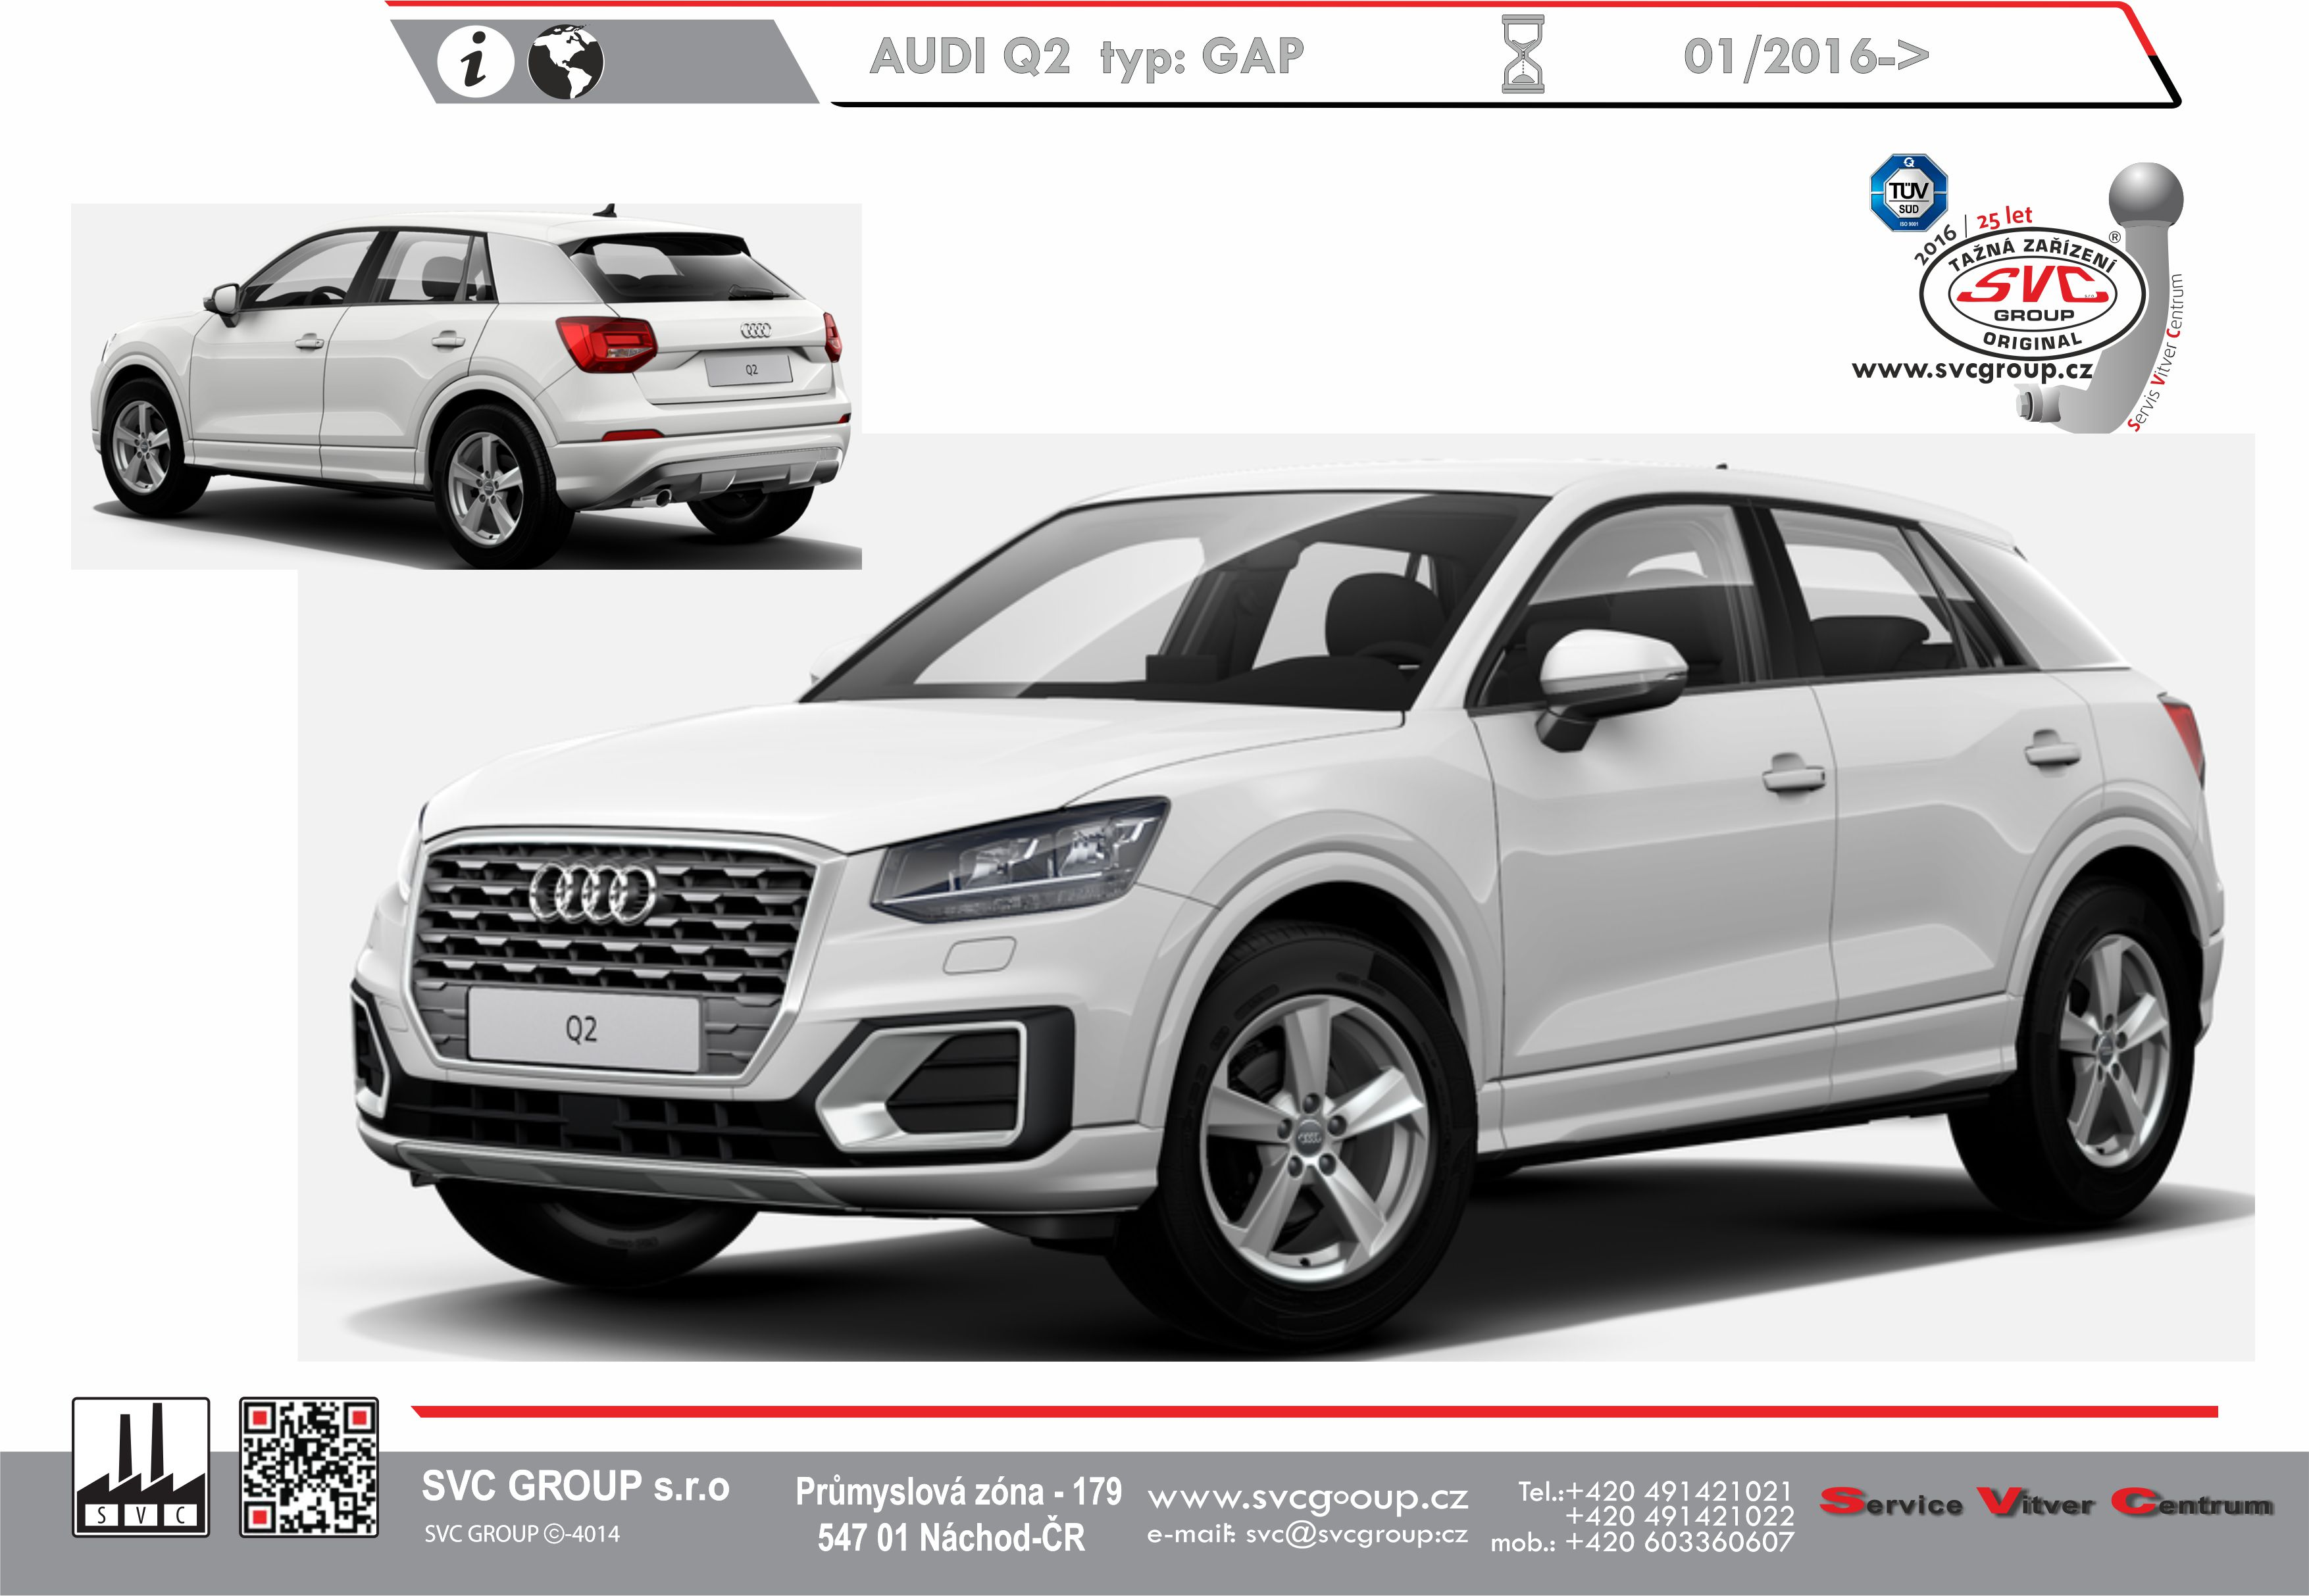 Audi Q2 GAB